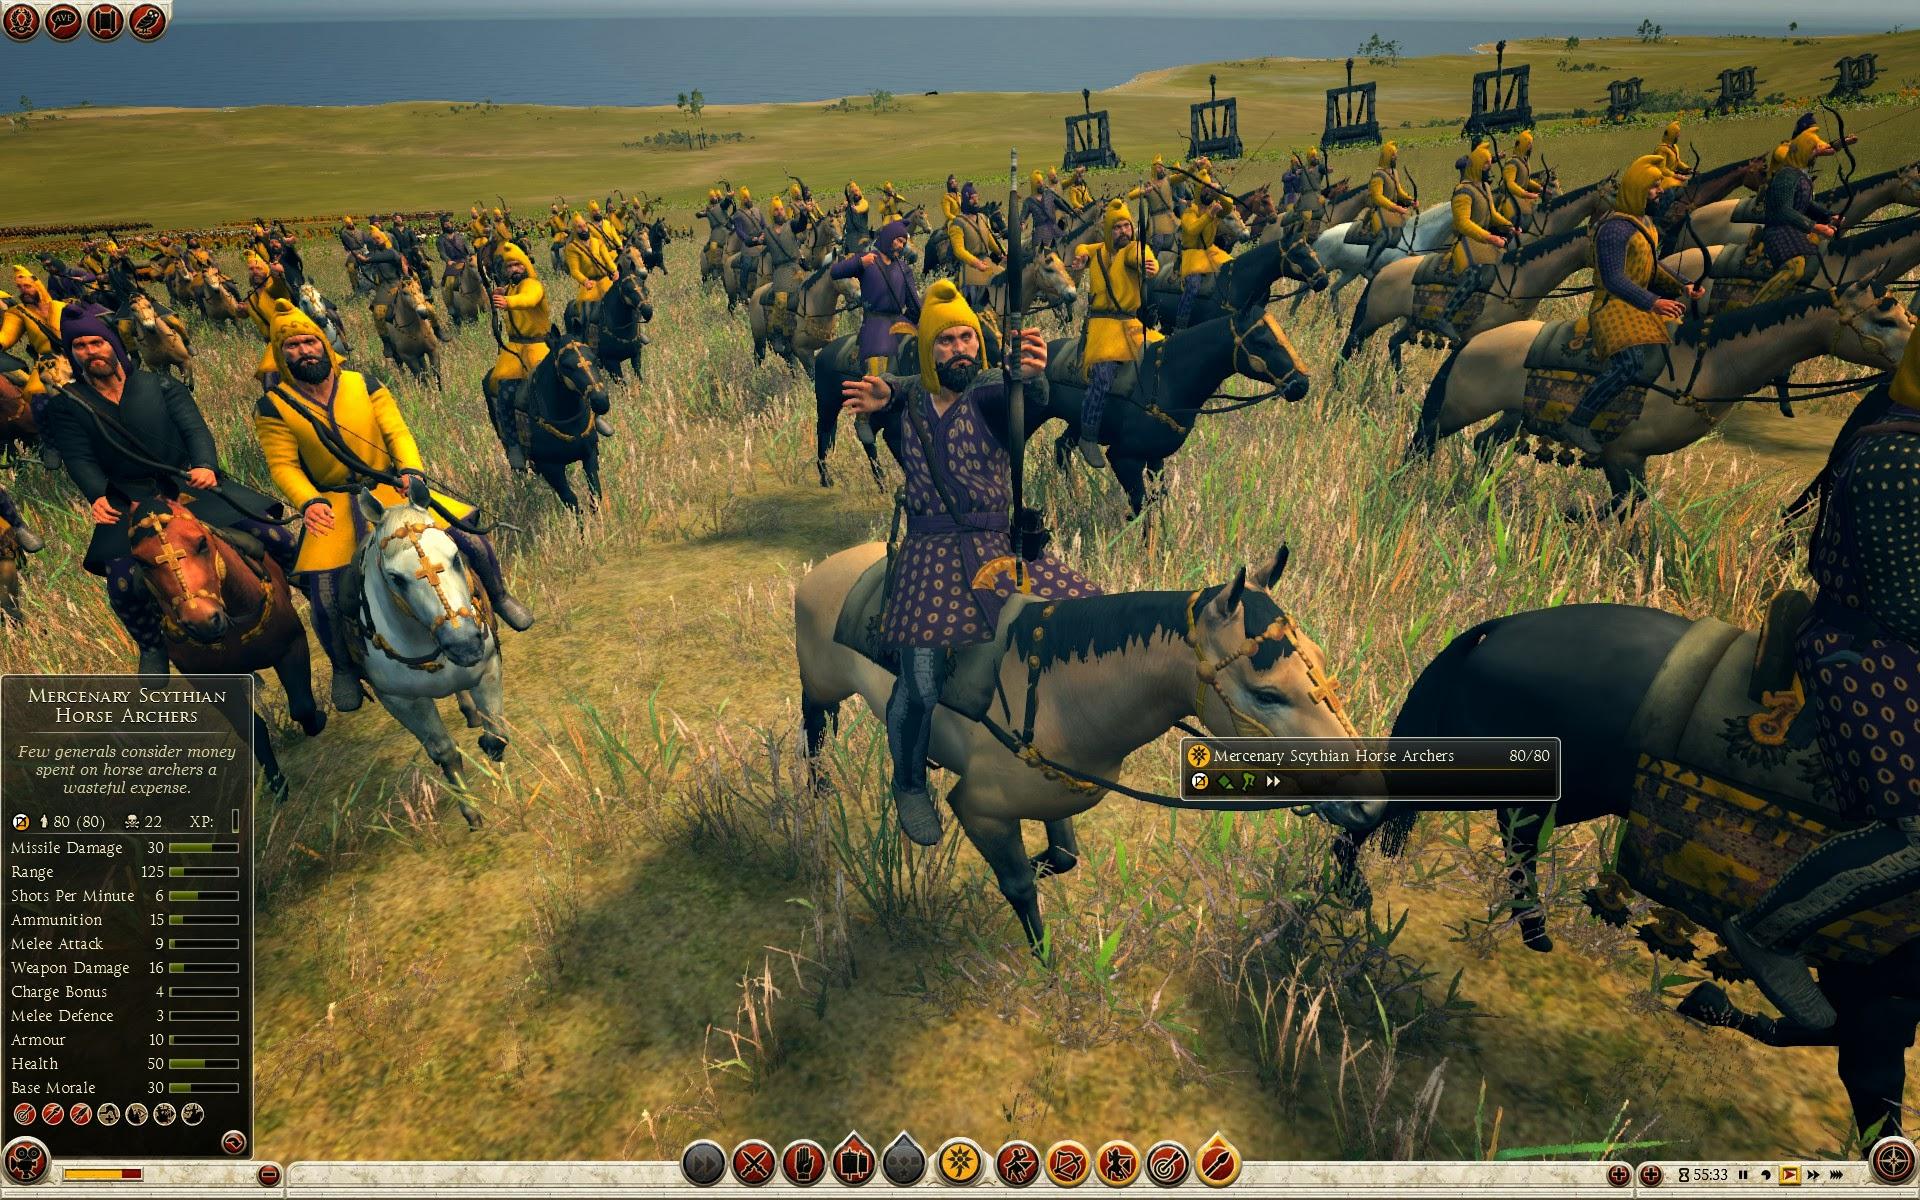 Mercenary Scythian Horse Archers